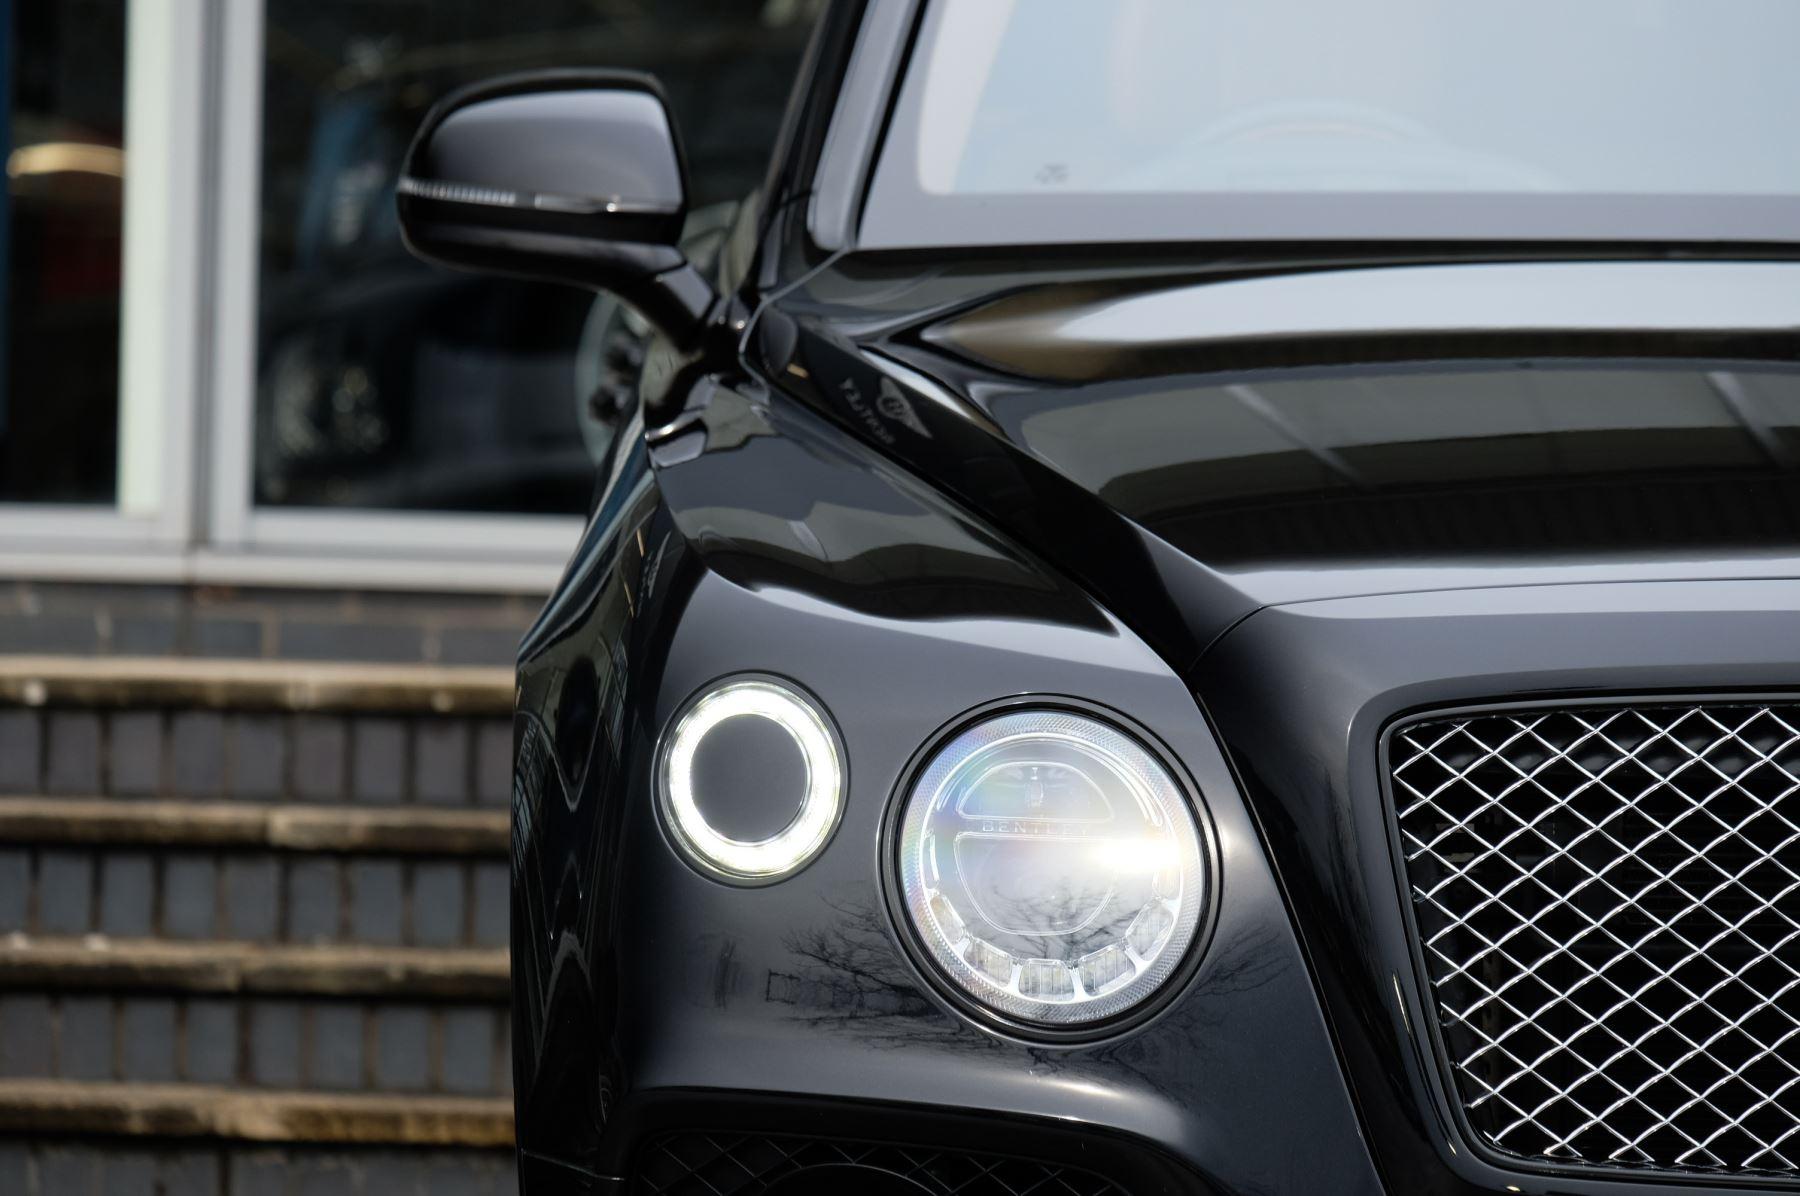 Bentley Bentayga 6.0 W12 5dr - Mulliner Driving Specification  image 7